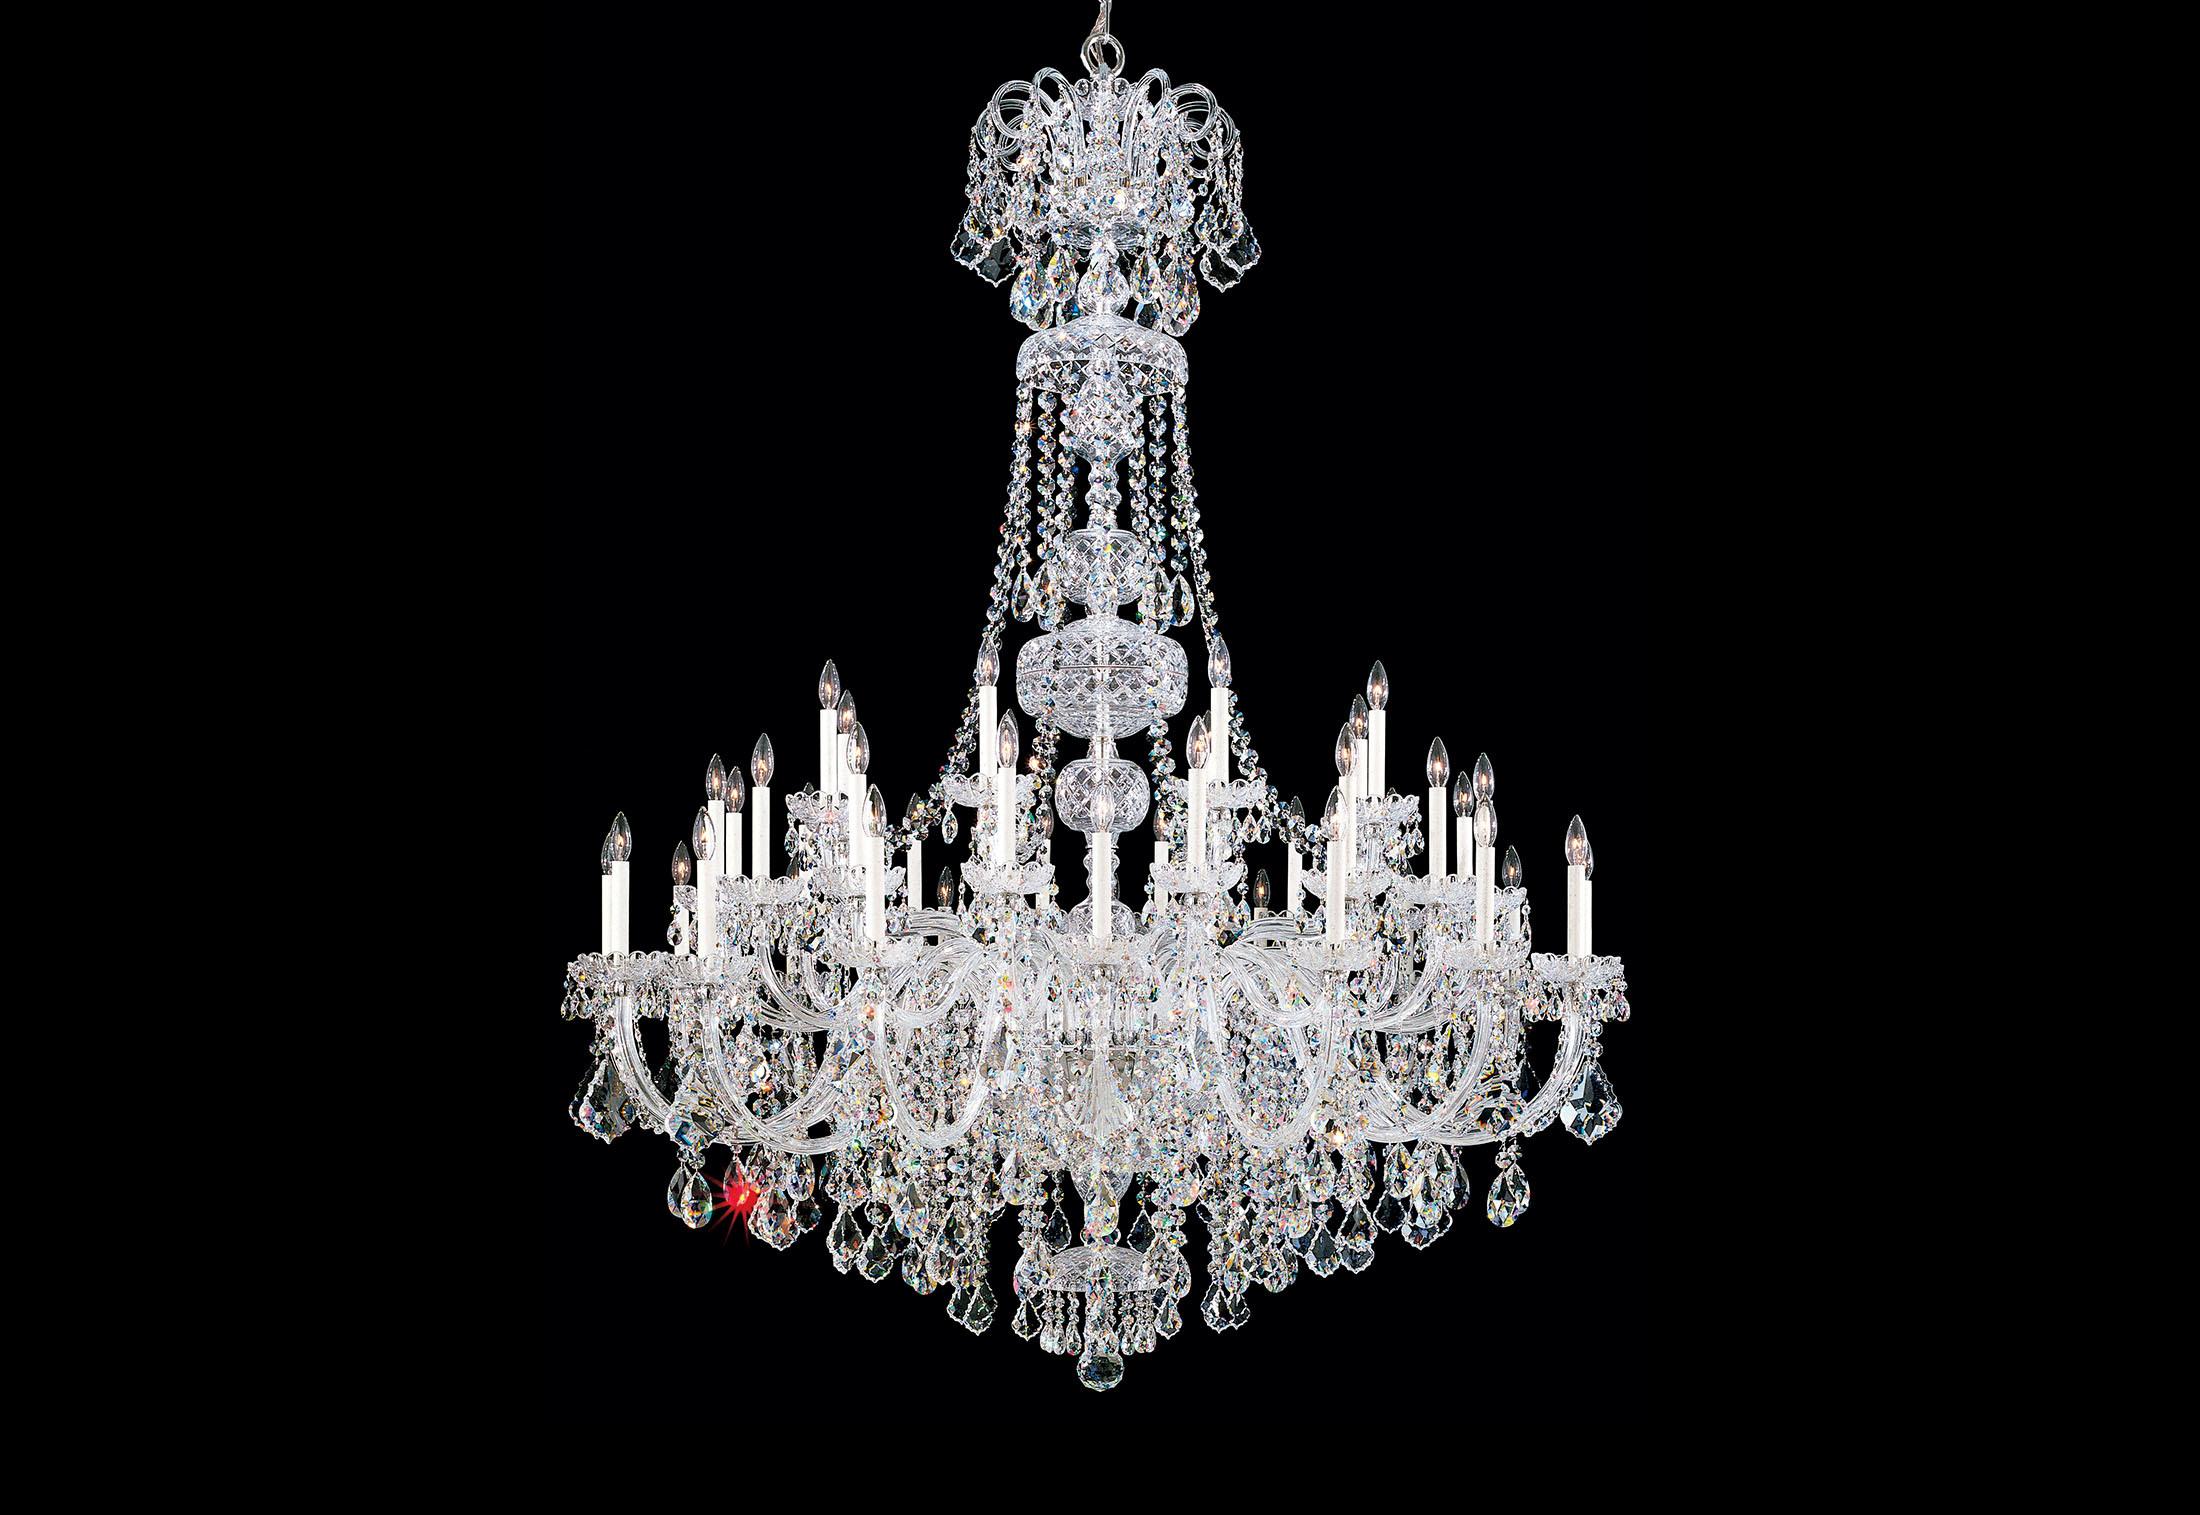 Olde World Chandelier By Swarovski Lighting Stylepark